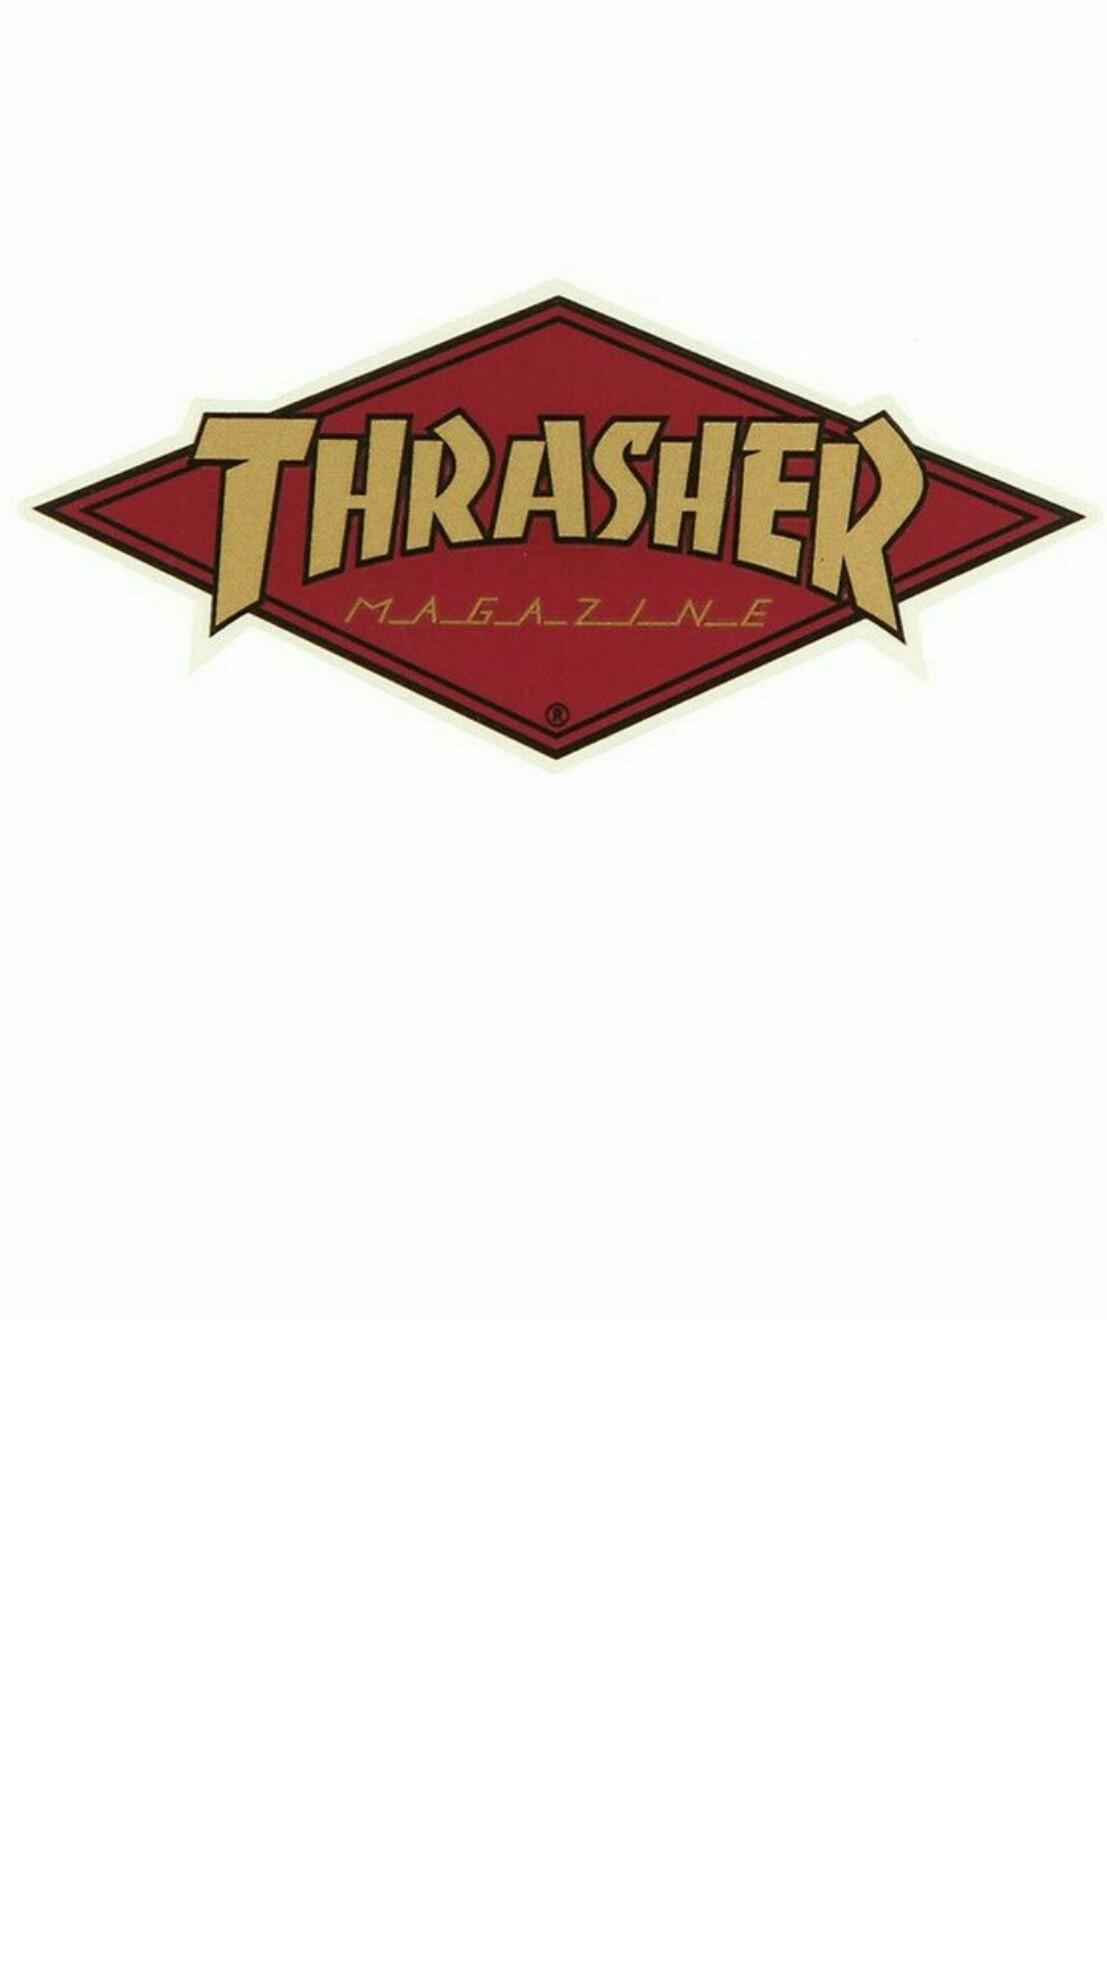 #thrasher #skate #usa #black #wallpaper #android #iphone